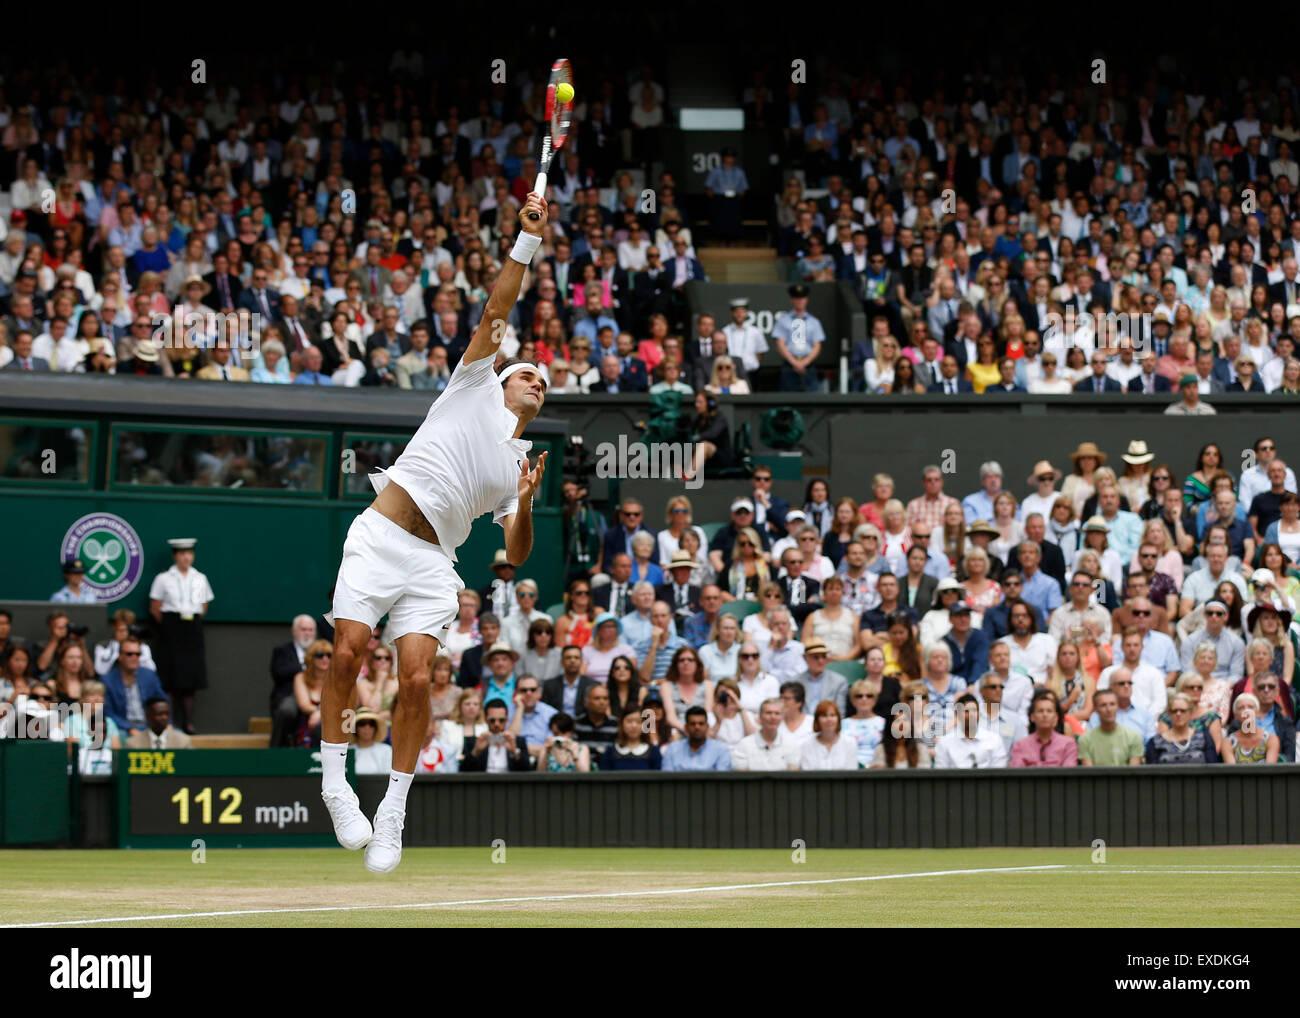 Wimbledon, London. 12th July, 2015. Roger Federer of Switzerland serves to Novak Djokovic of Serbia during the men's - Stock Image